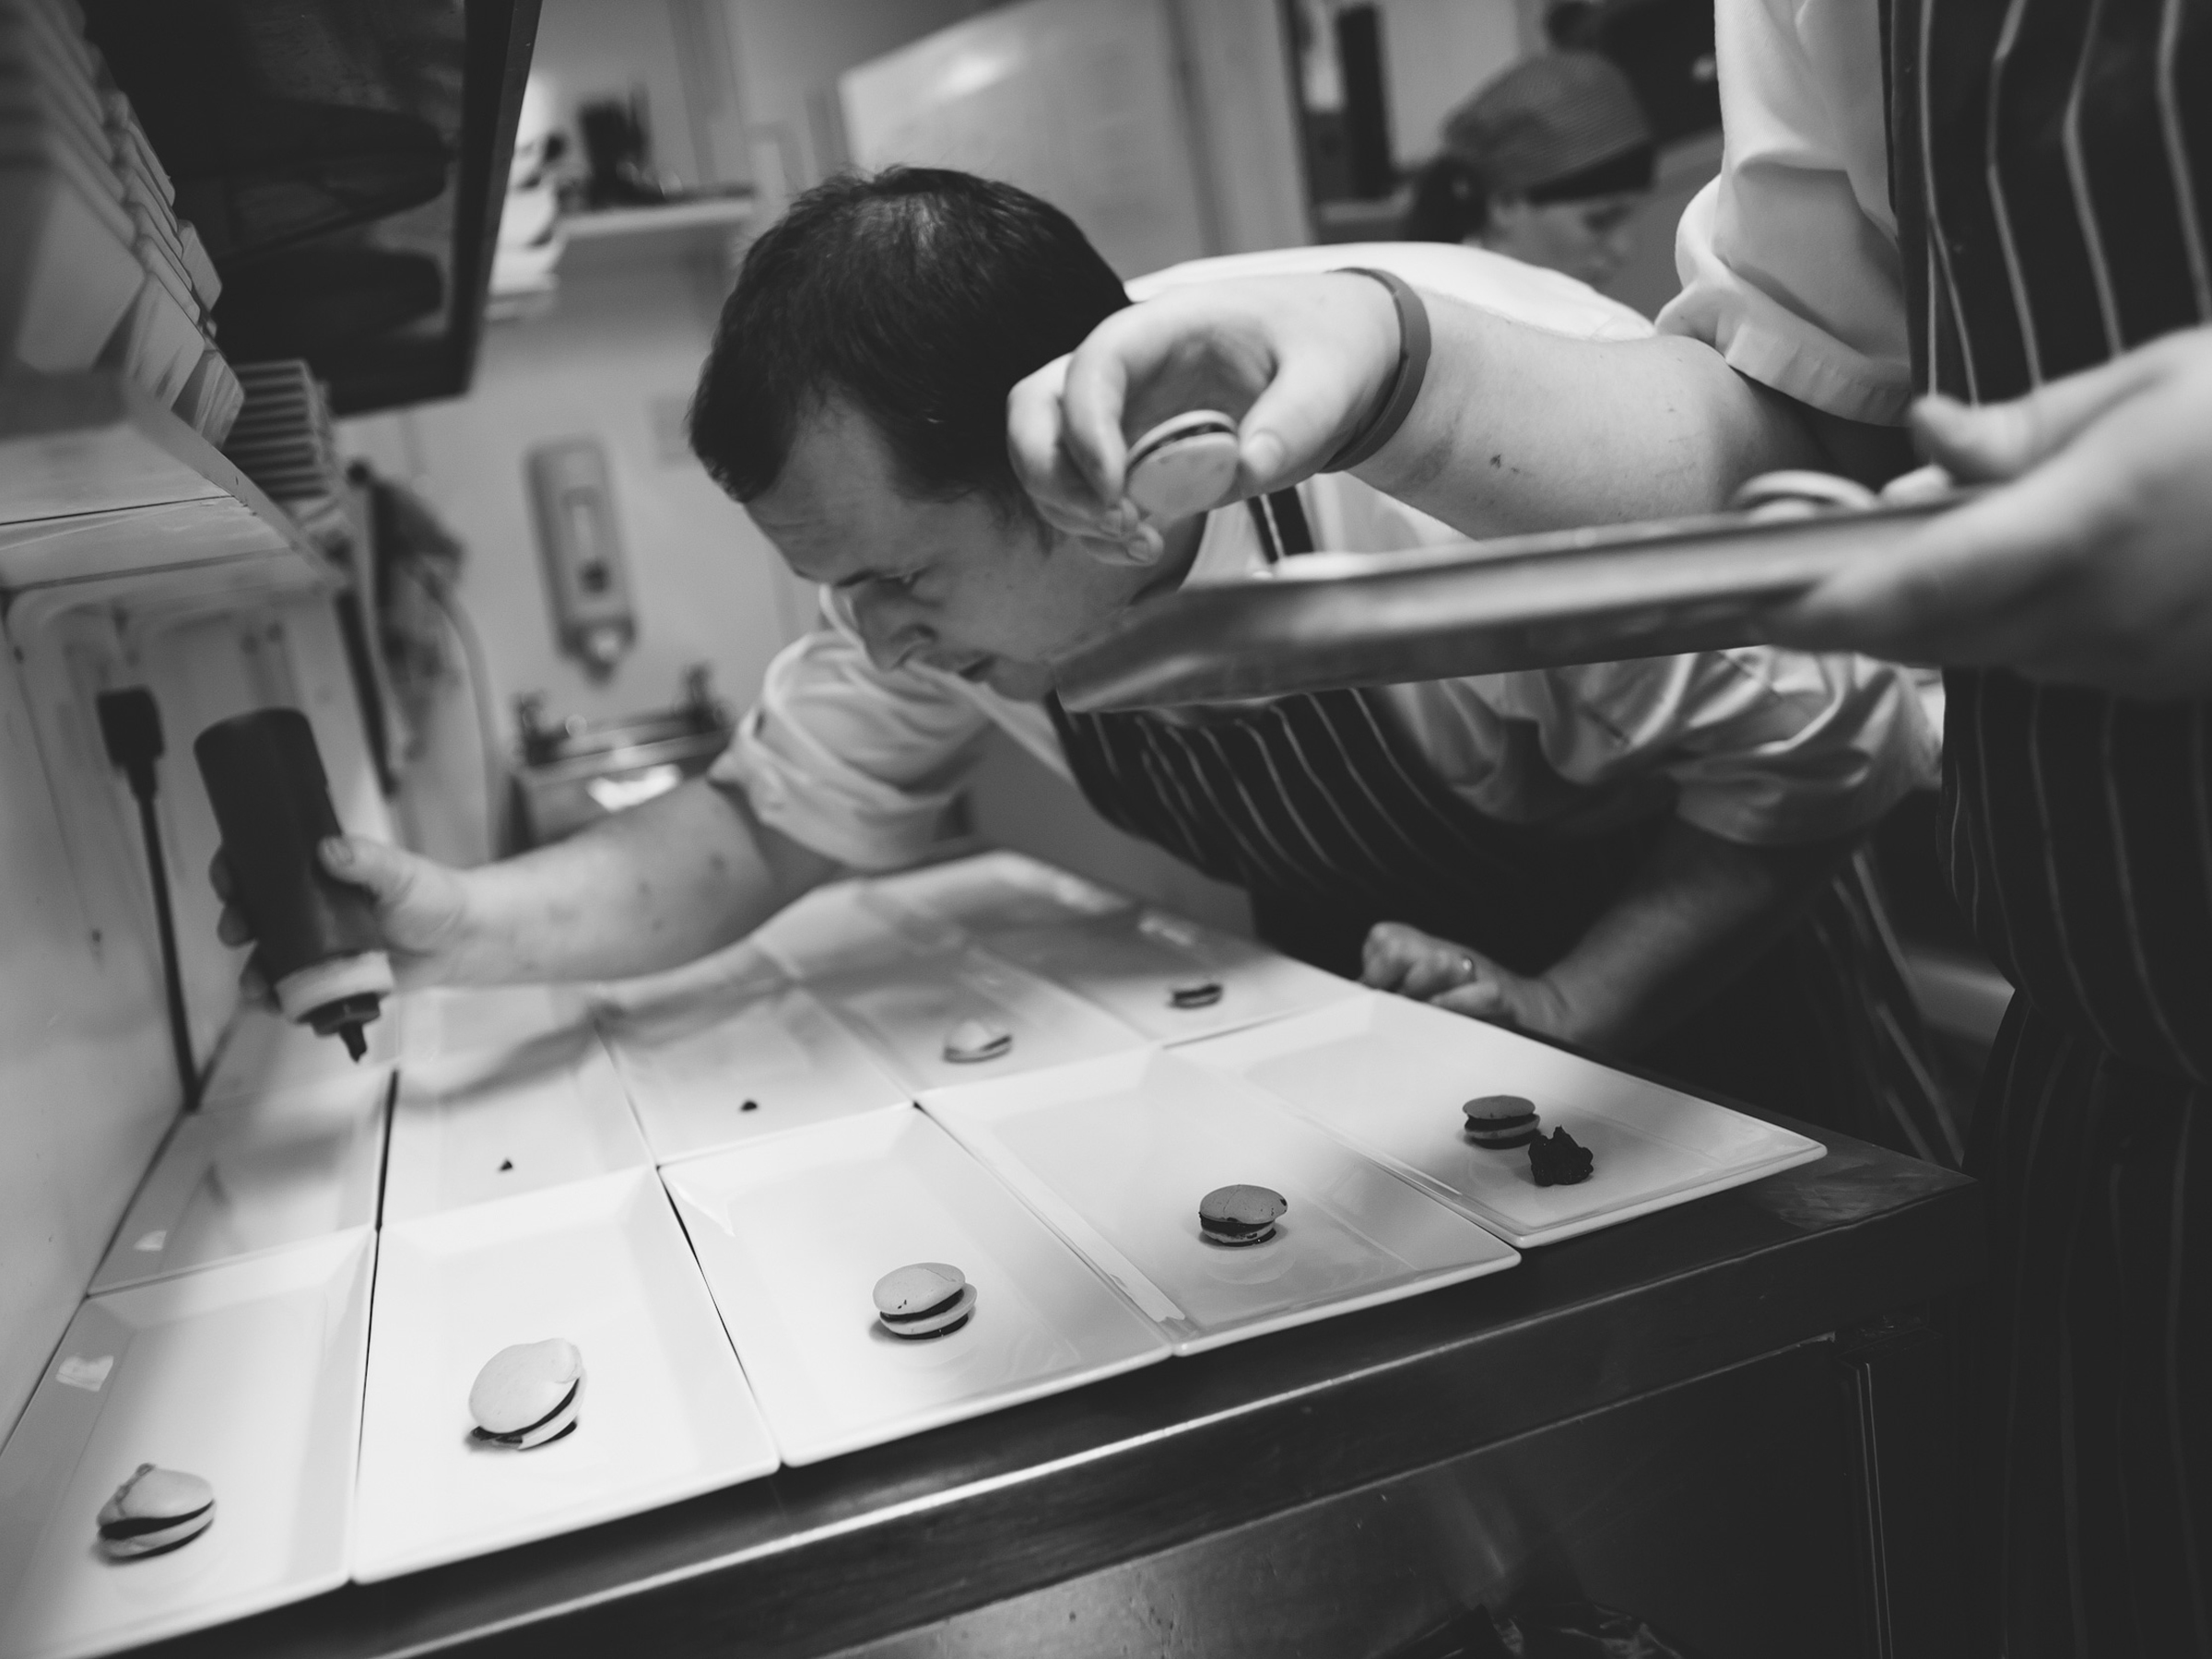 papamacs-restaurant-johnstone-chef-plating-up-food-preparation-1